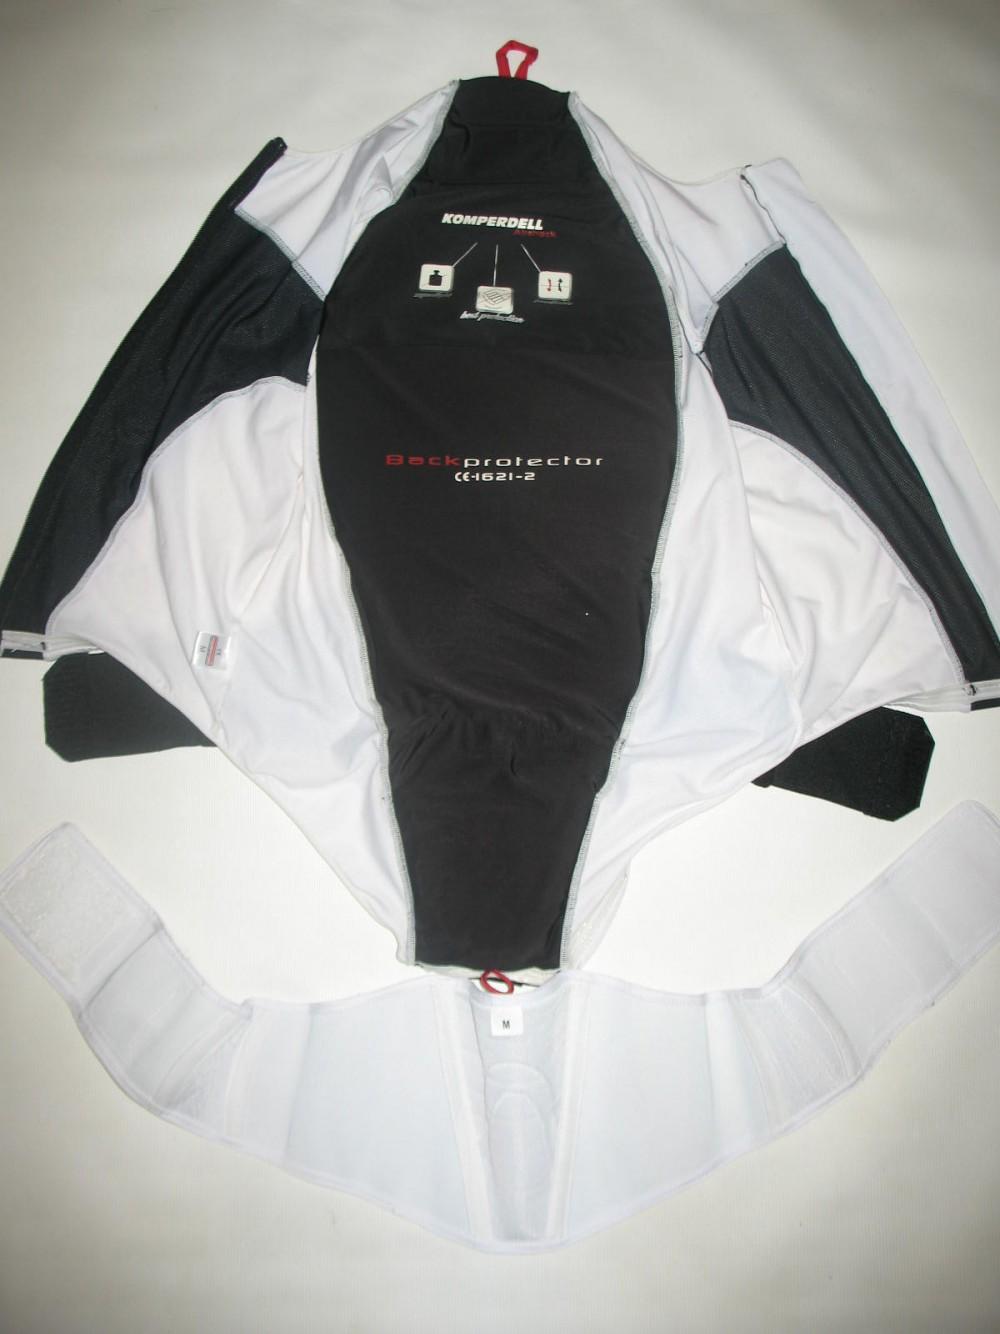 Жилет защита KOMPERDELL airshock vest back protector (размер M(на рост 170-180 см)) - 3